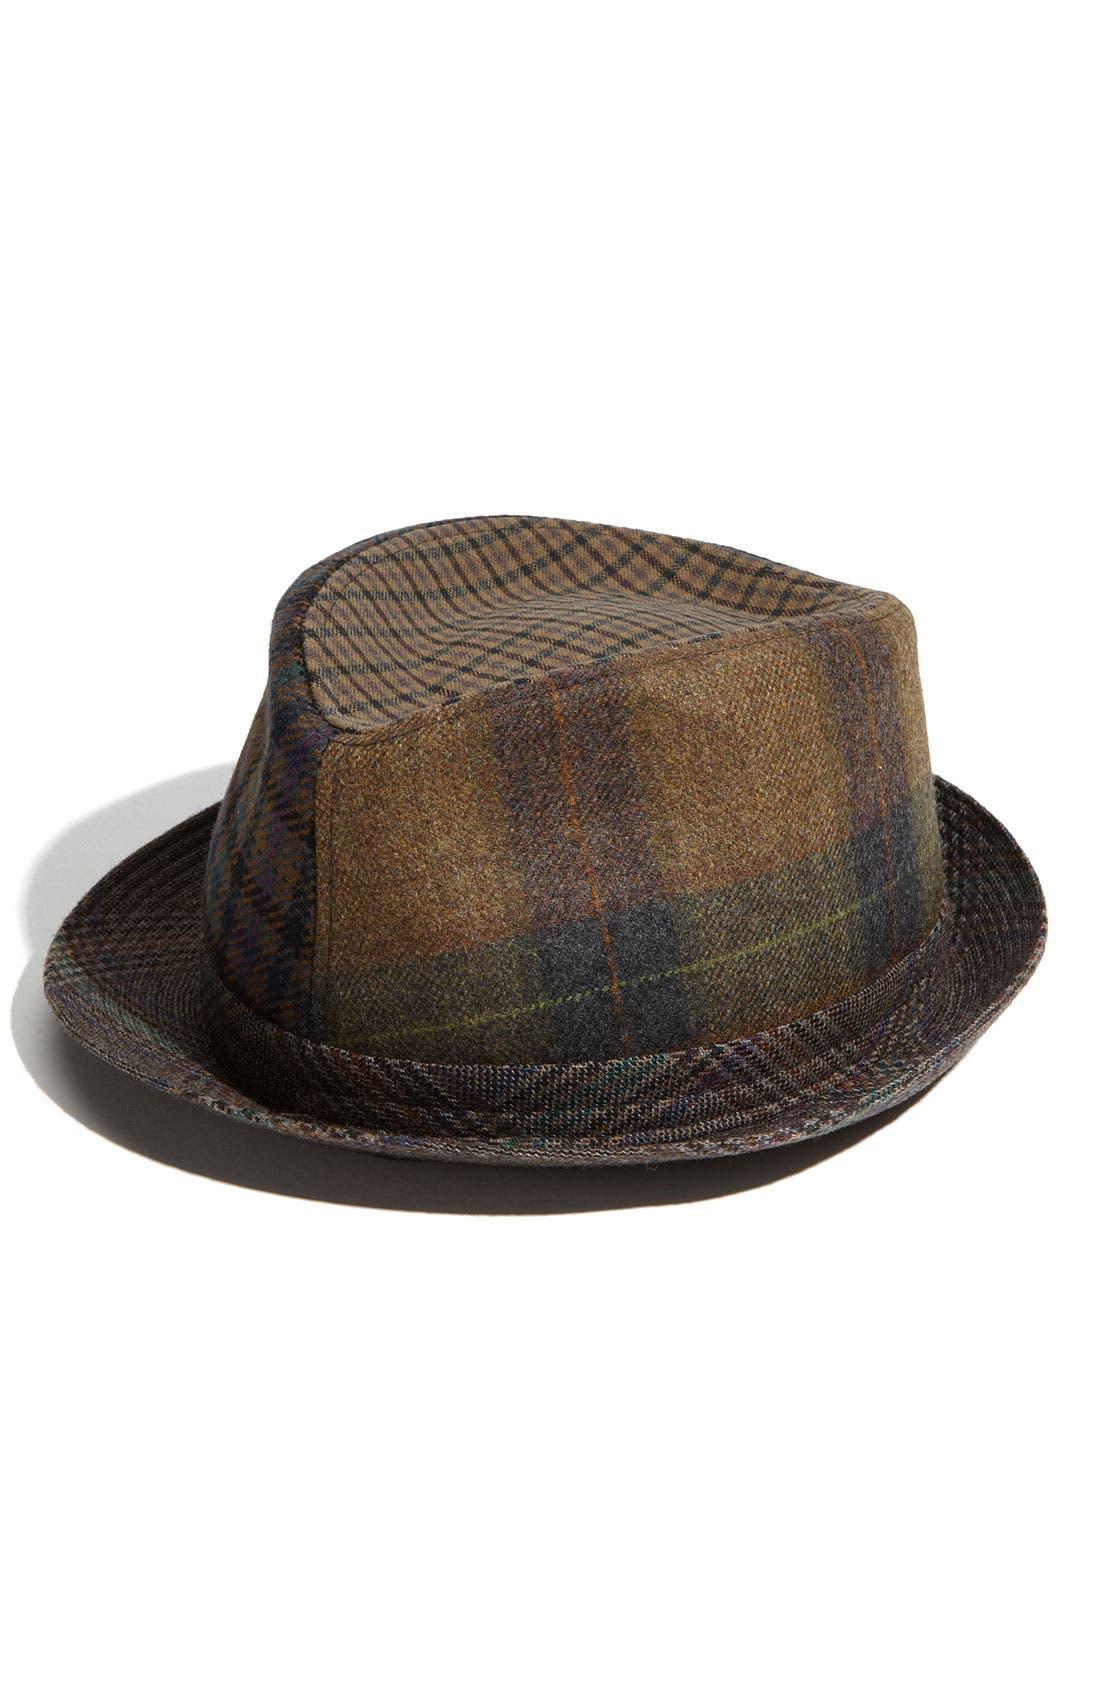 Main Image - Etro Mixed Print Wool Hat